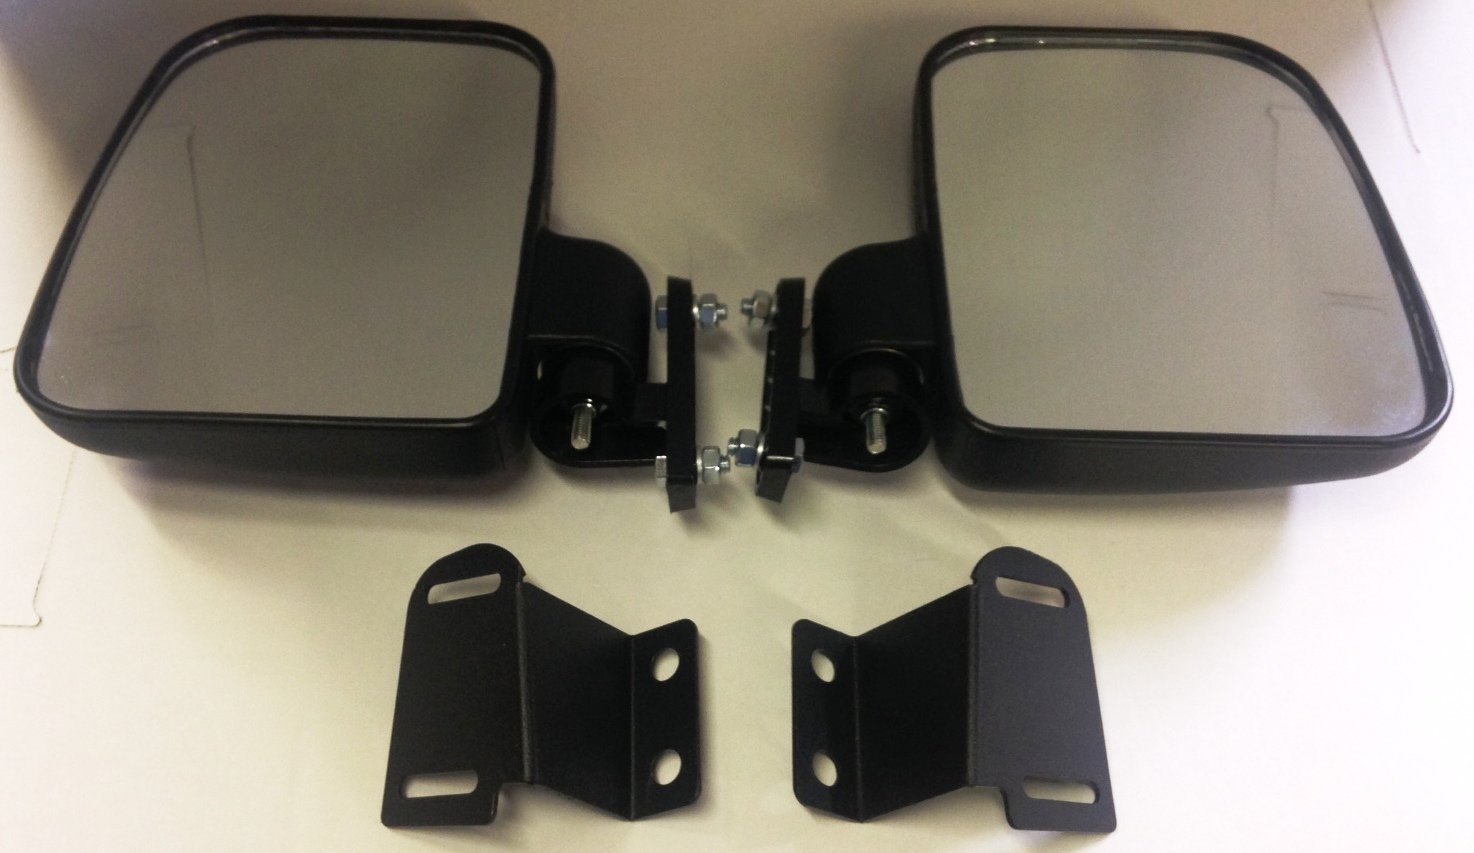 Side View Mirror Set Fits Polaris Ranger 570 2015+ Lock N Ride Cab Frame (NOT FOR ROUND ROLL BARS) Maverick Advantage